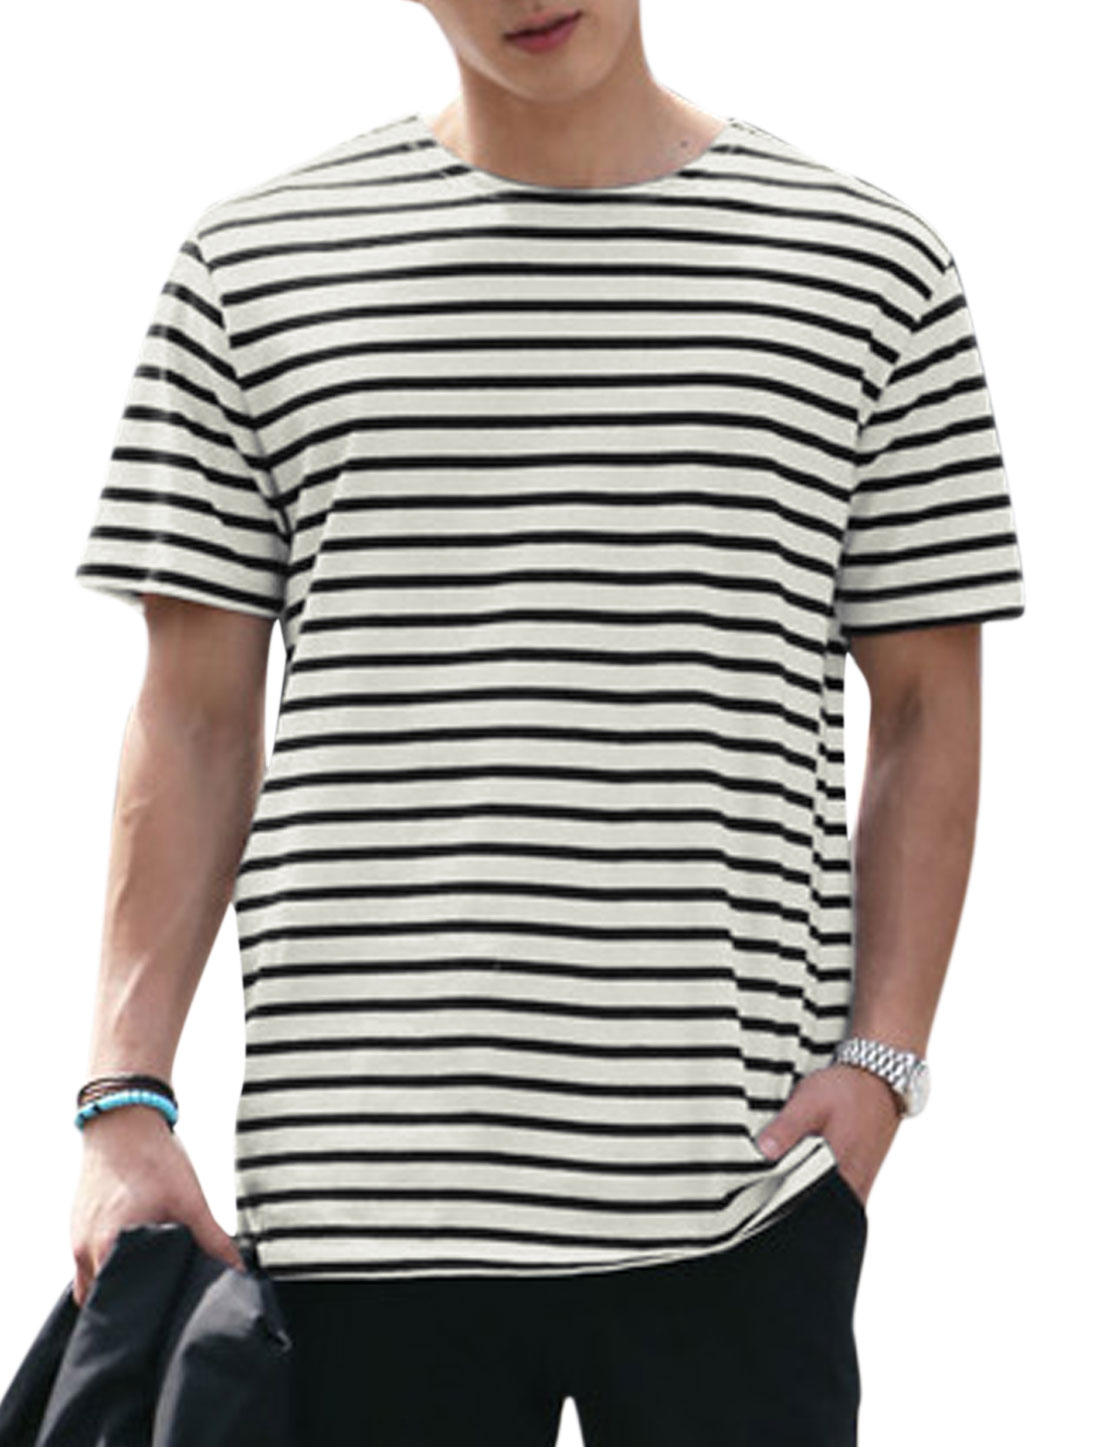 Men Short Sleeves Horizontal Stripes T-Shirts Black Off White S